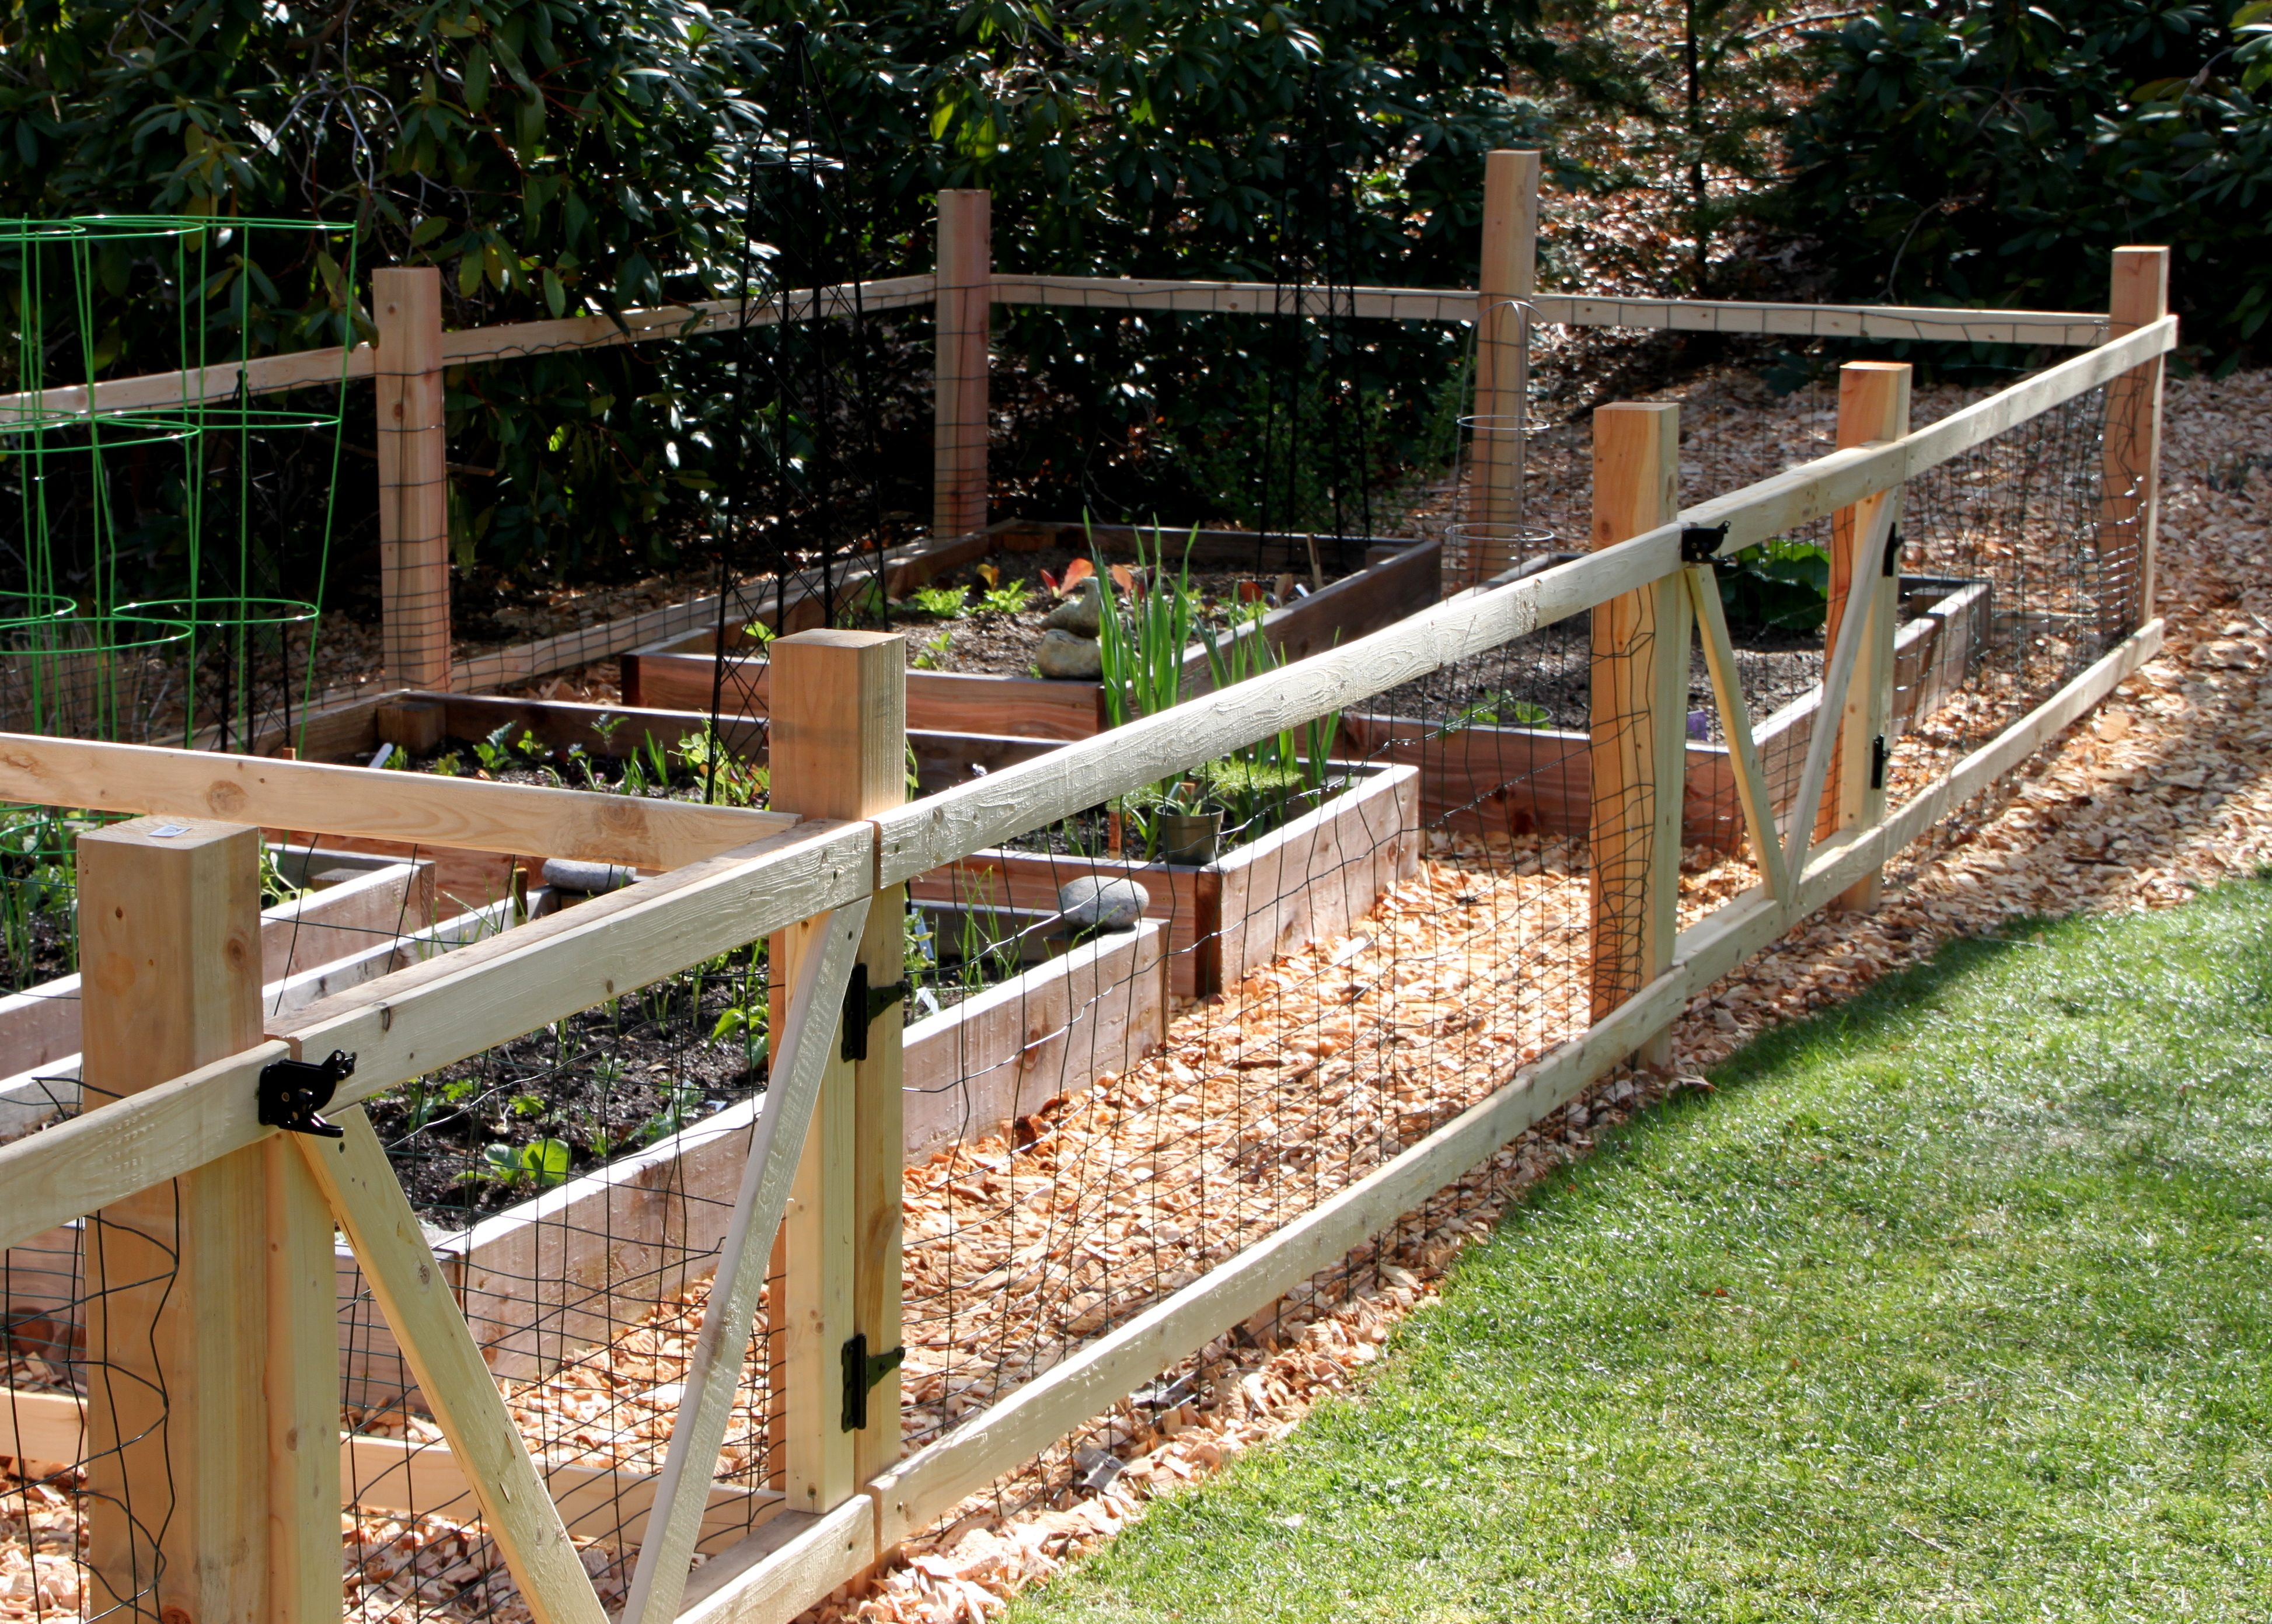 A Simple Garden Fence | Tillyu0027s Nest